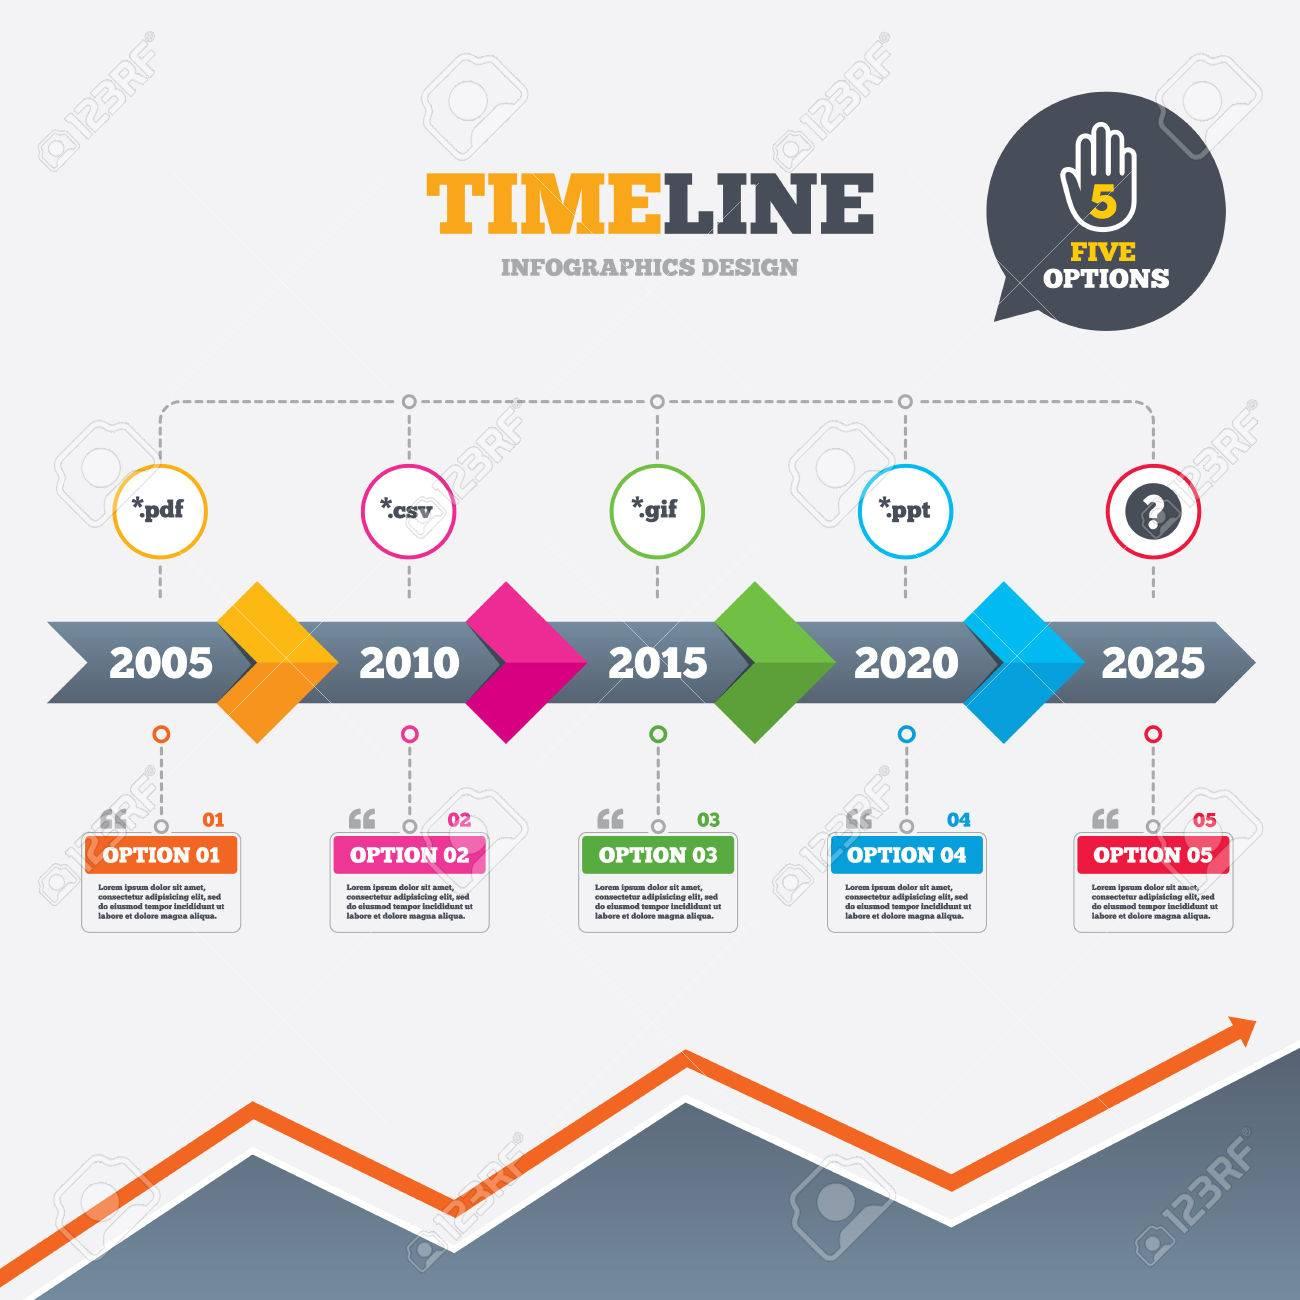 Timeline infographic with arrows document icons file extensions timeline infographic with arrows document icons file extensions symbols pdf gif toneelgroepblik Images